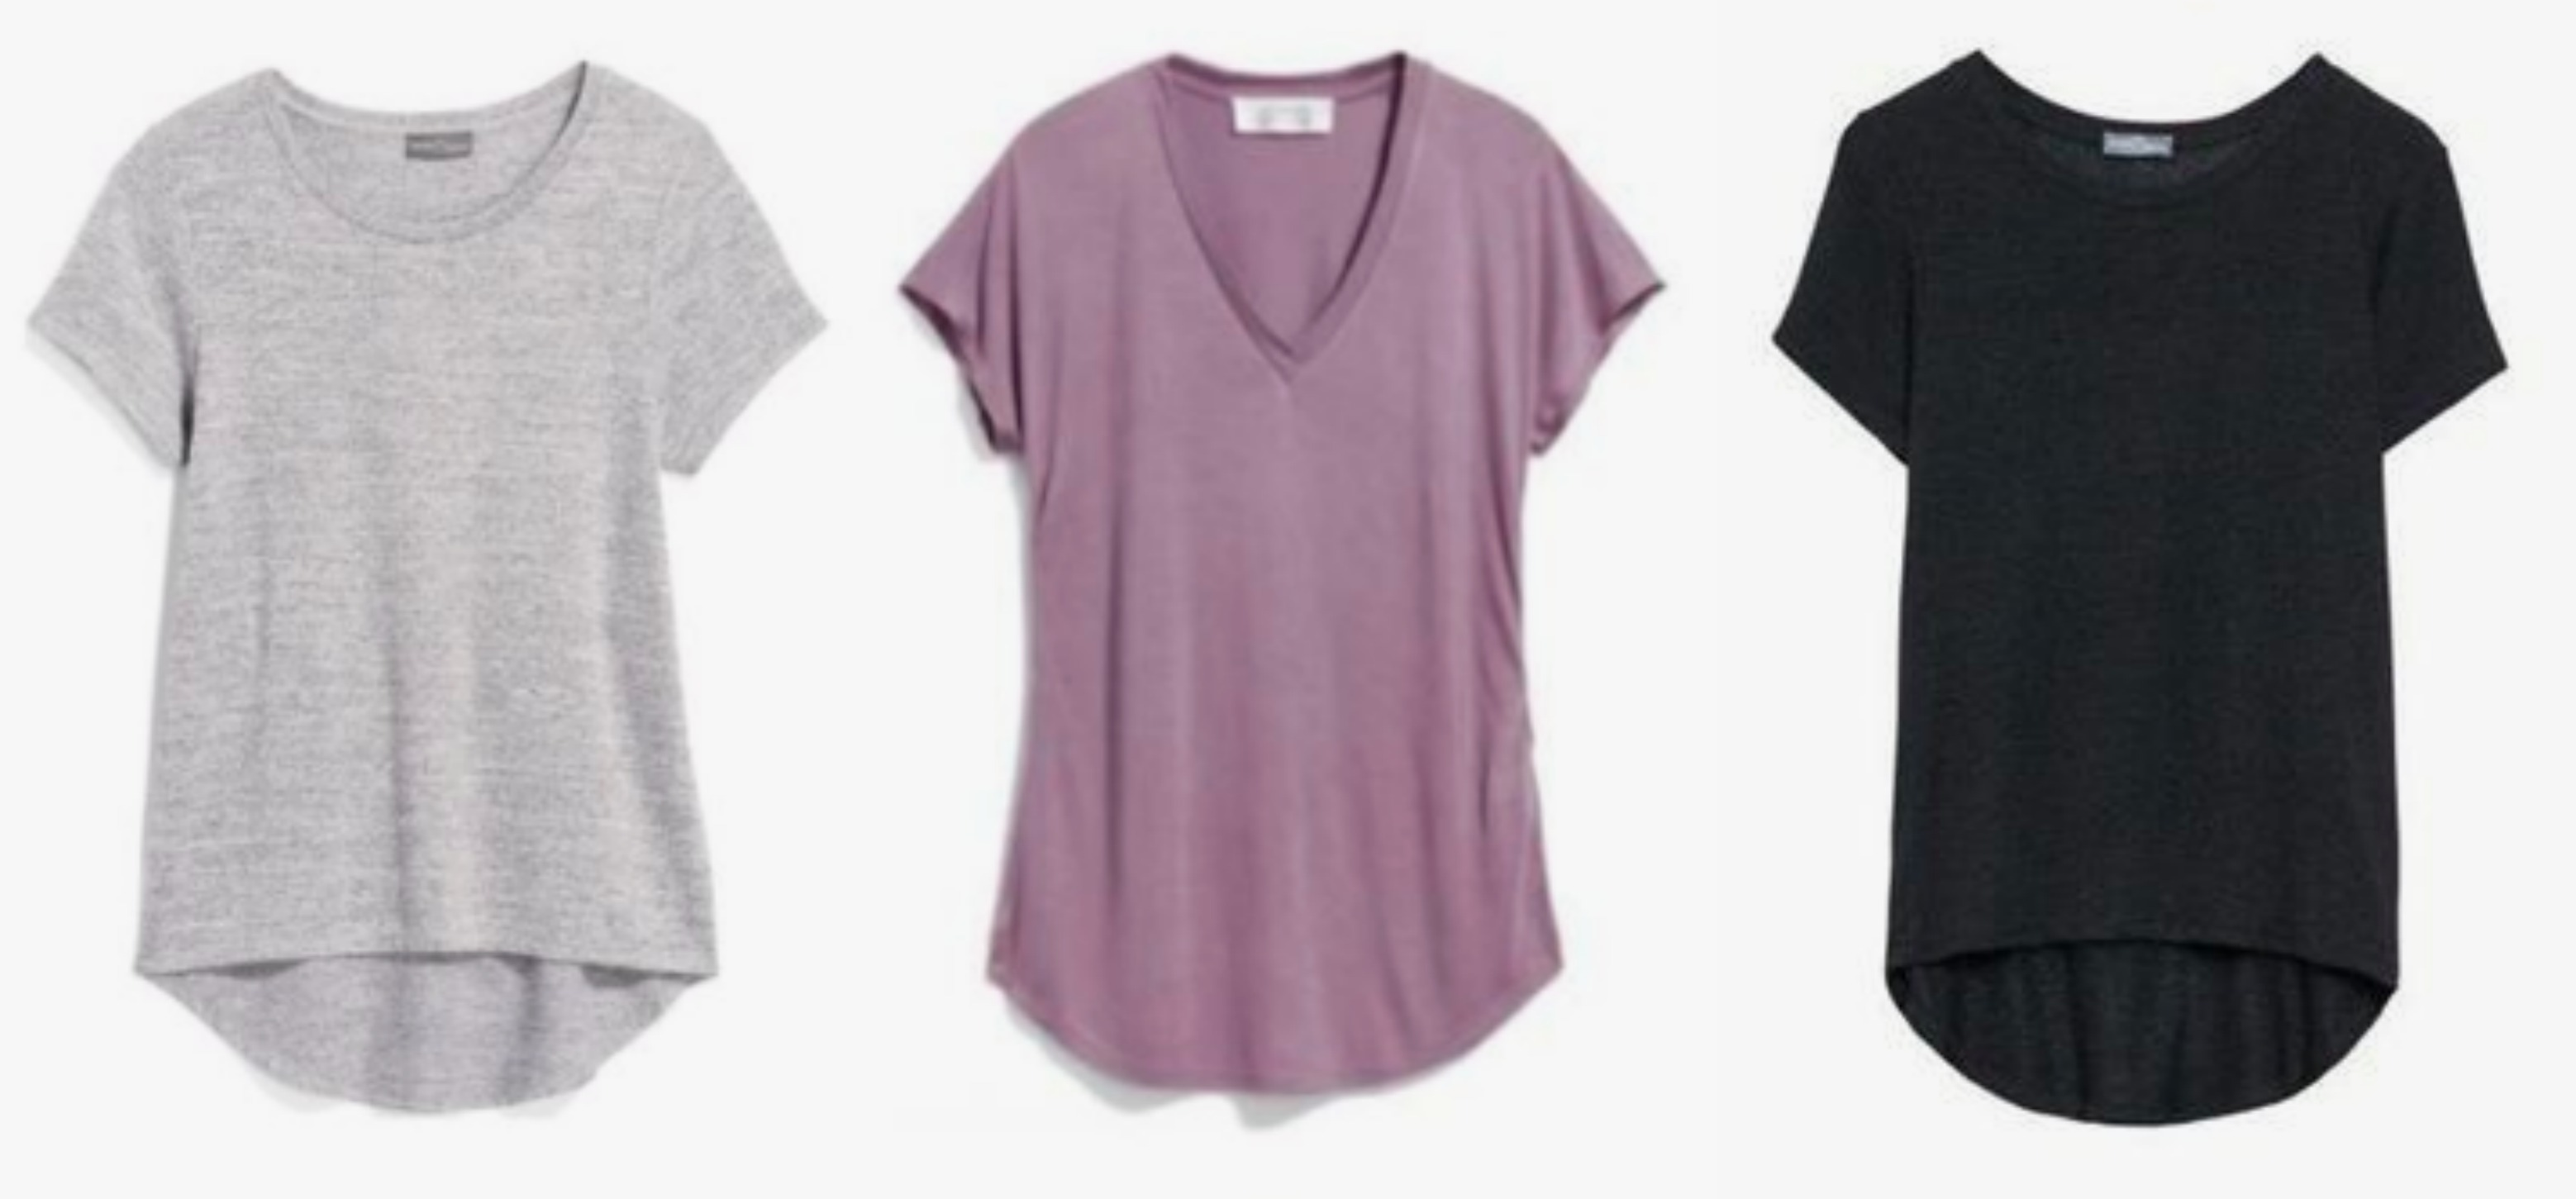 pregnancy friendly tee shirts